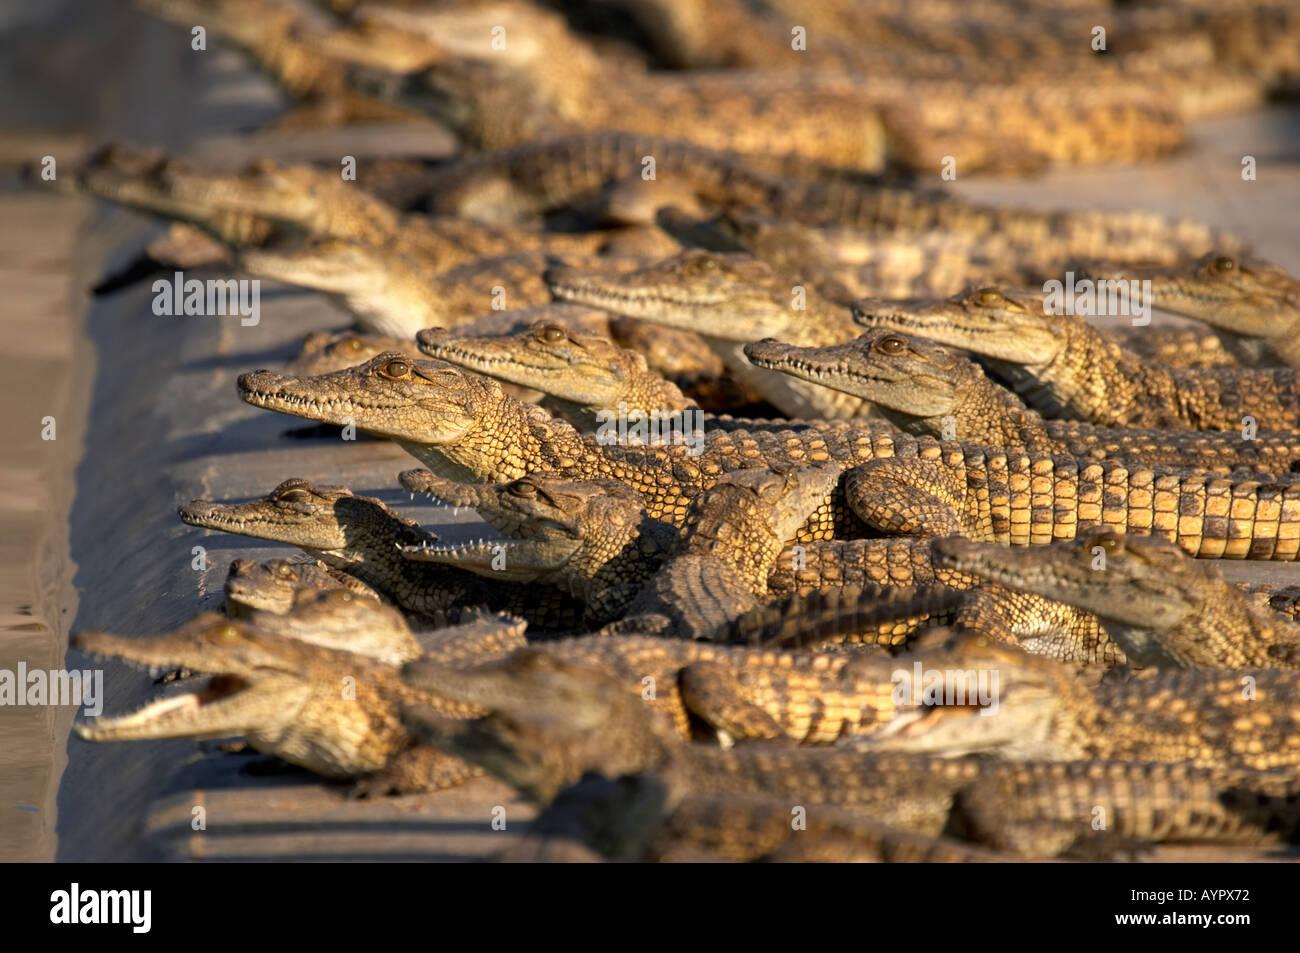 Nile crocodile Farm (Crocodylus niloticus) - Stock Image